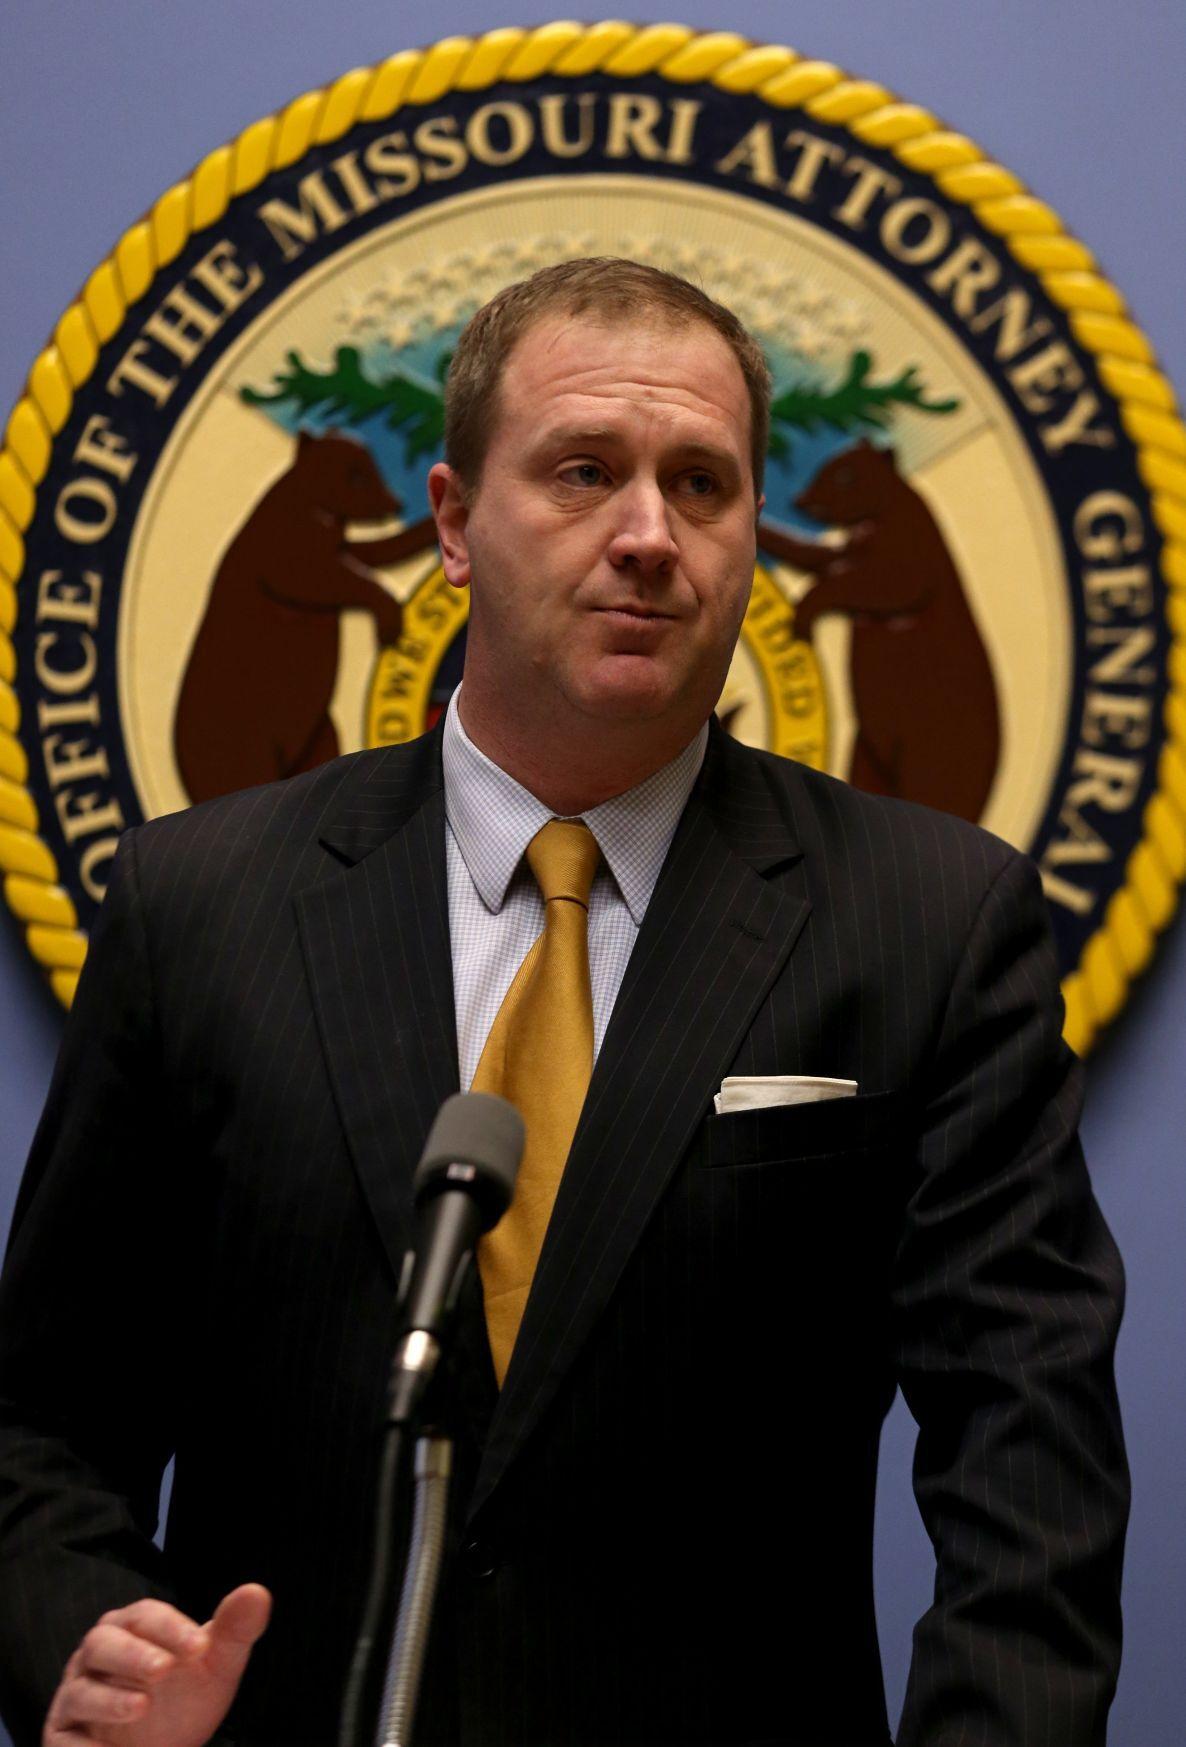 Missouri A.G. announces new partnership with U.S. Attorney